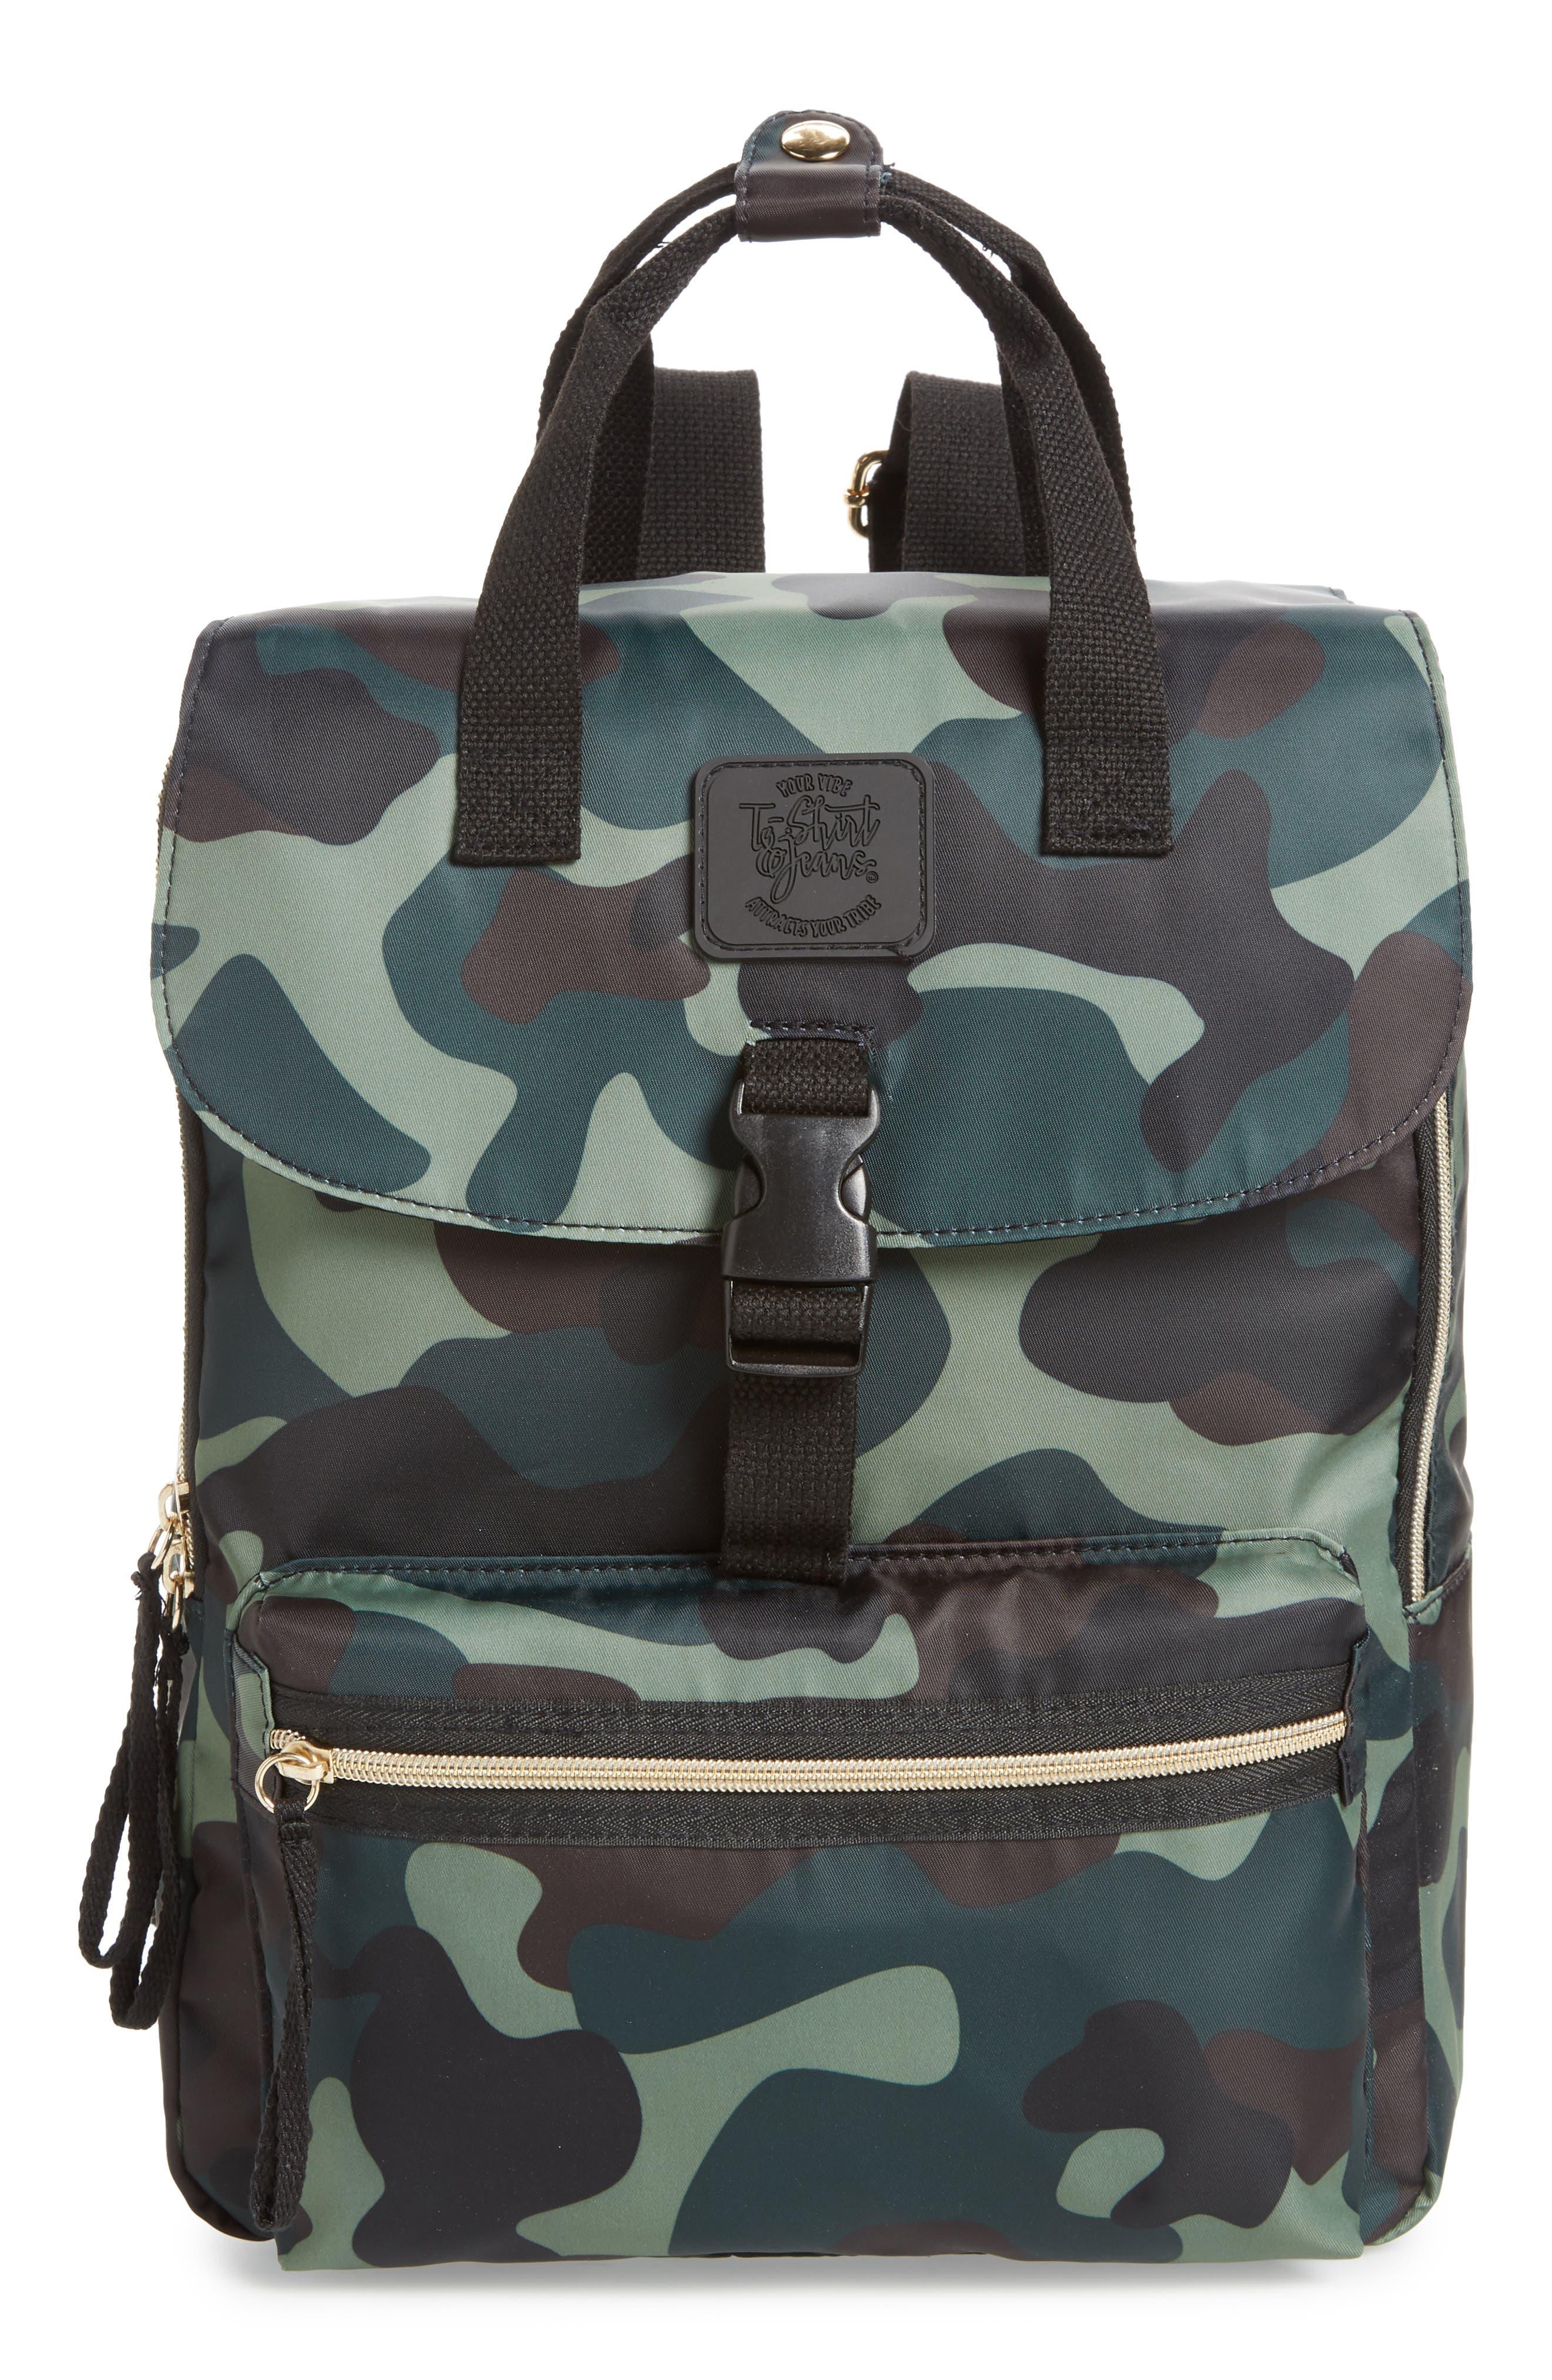 Camouflage Nylon Backpack,                             Main thumbnail 1, color,                             Camo Green